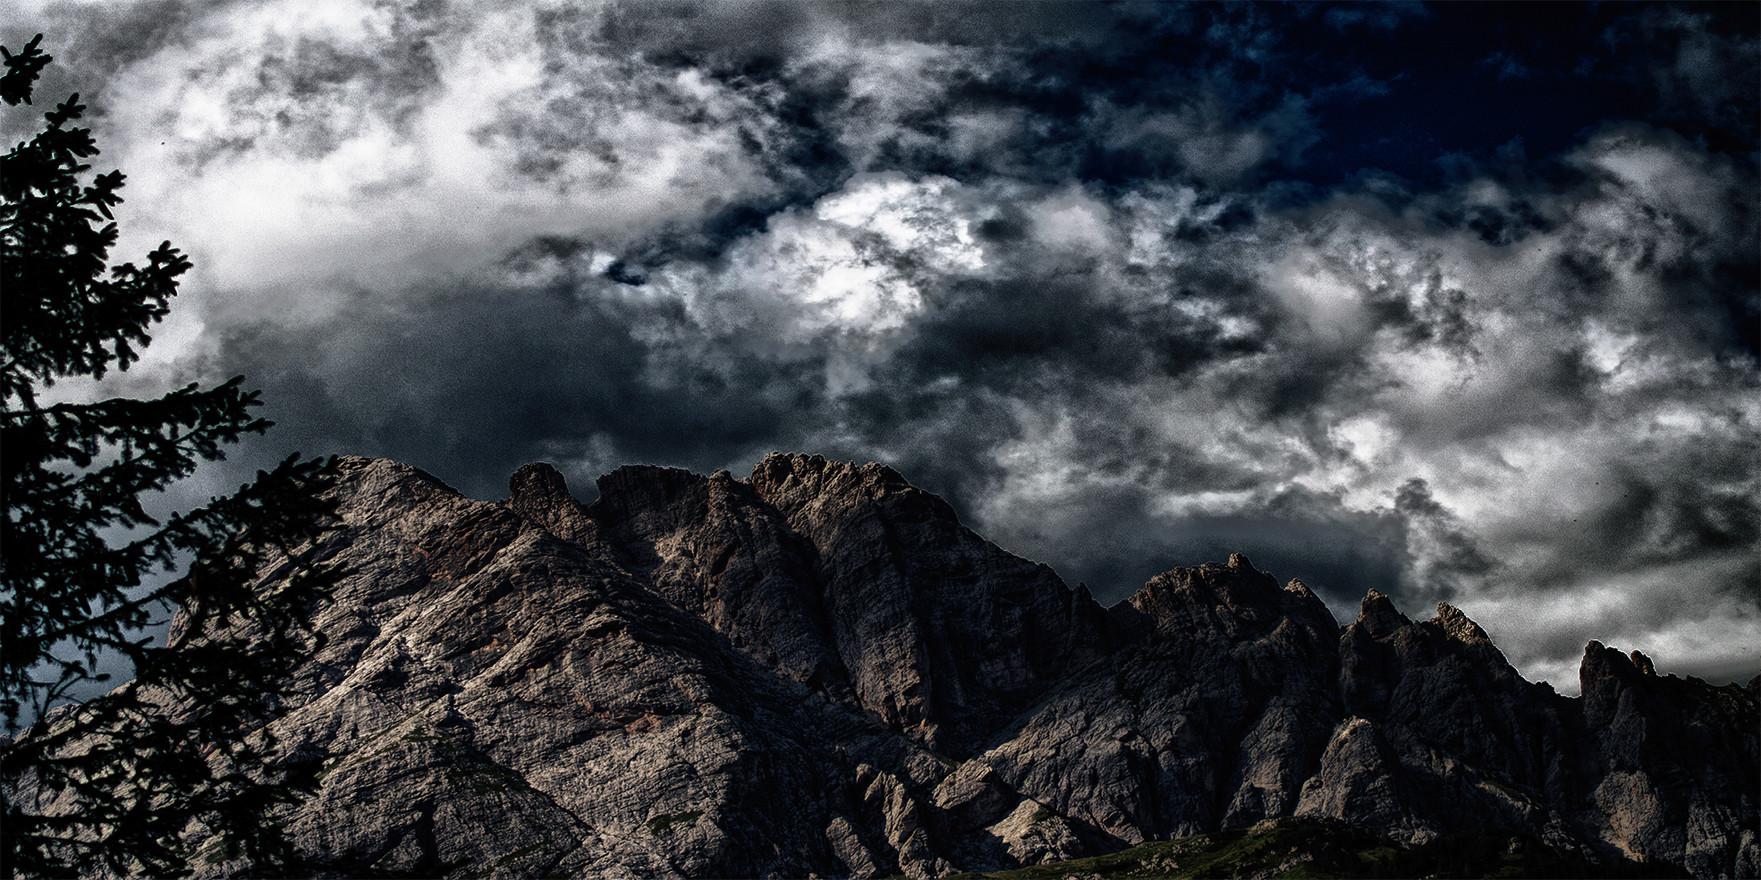 montagna.jpg